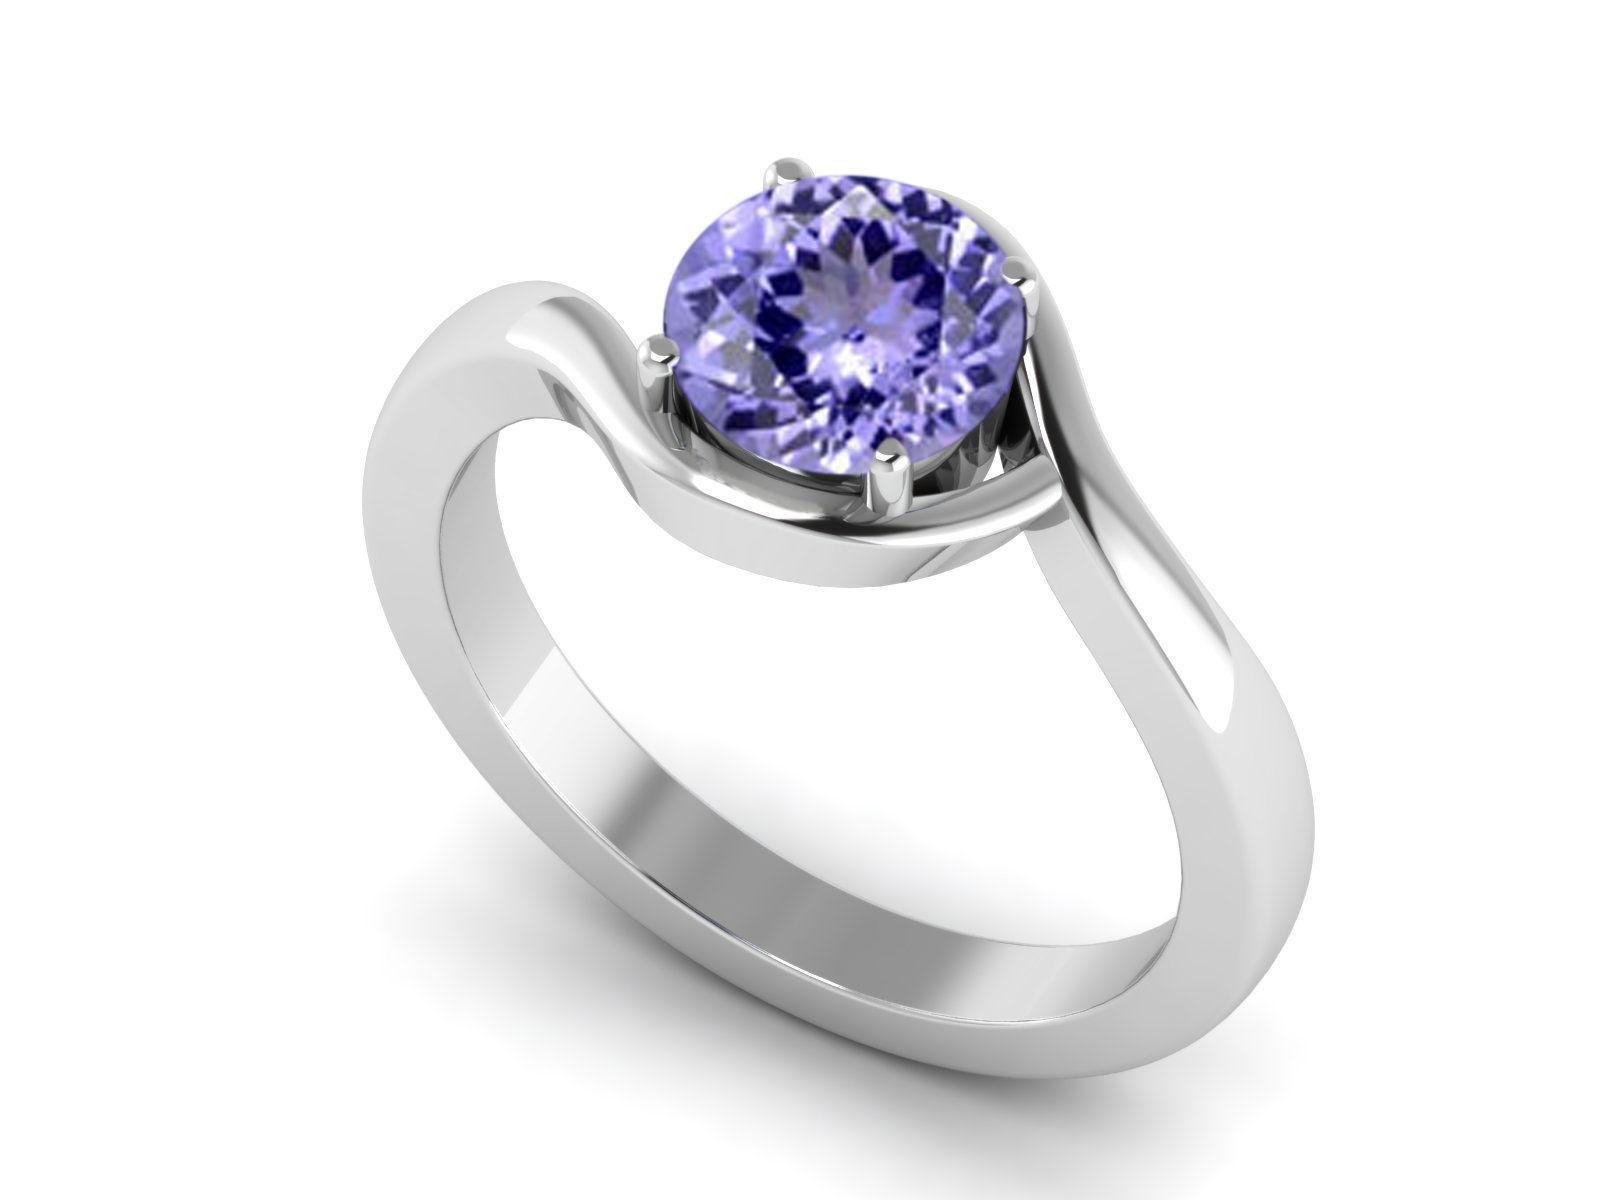 Classical Tanzanite Gemstone 925 Sterling Silver Ring US Size 7 SHRI1113